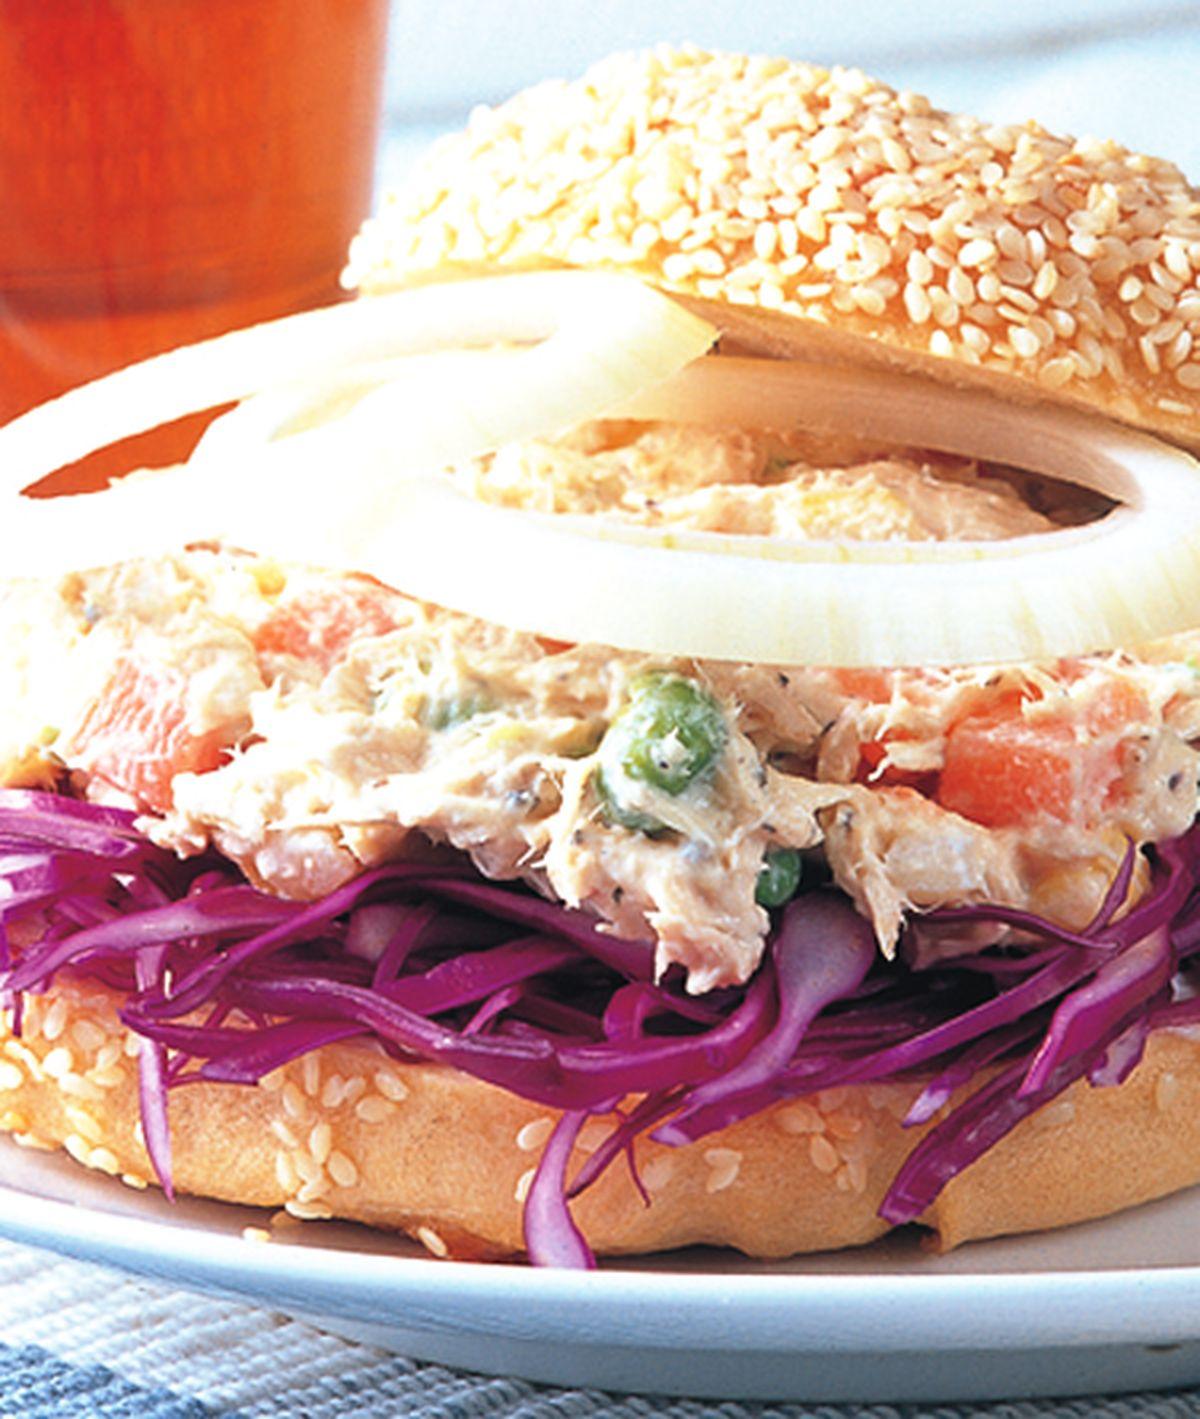 食譜:DHA鮪魚Bagel